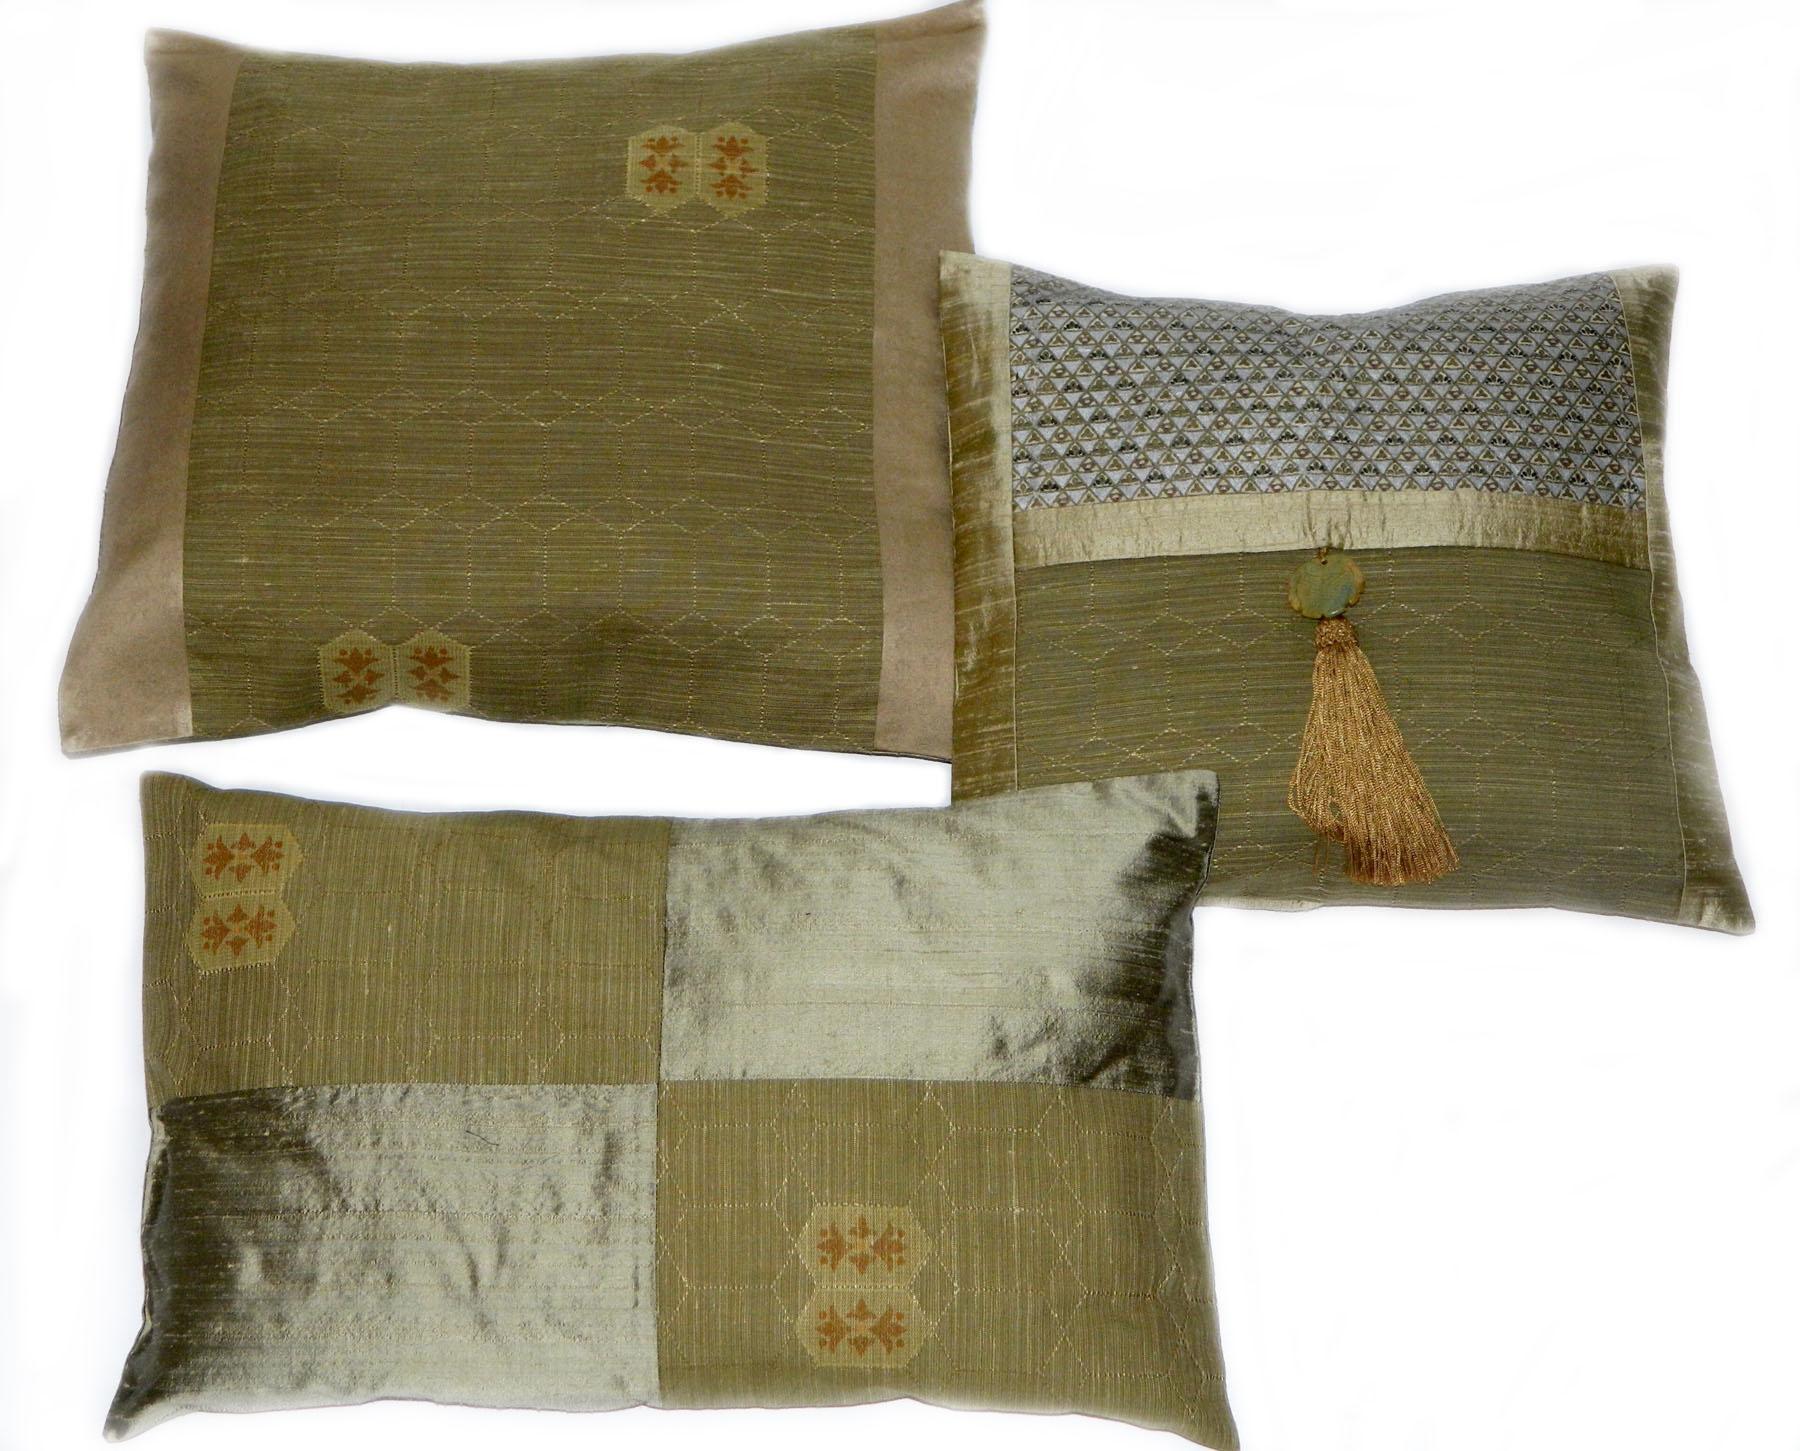 Top left: KP 276A, 18 x 18 in. Bottom left: KP276C, 13 x 20 in. Right: OP 428A, 15 x 15 in.with silk tassel and bone amulet trim